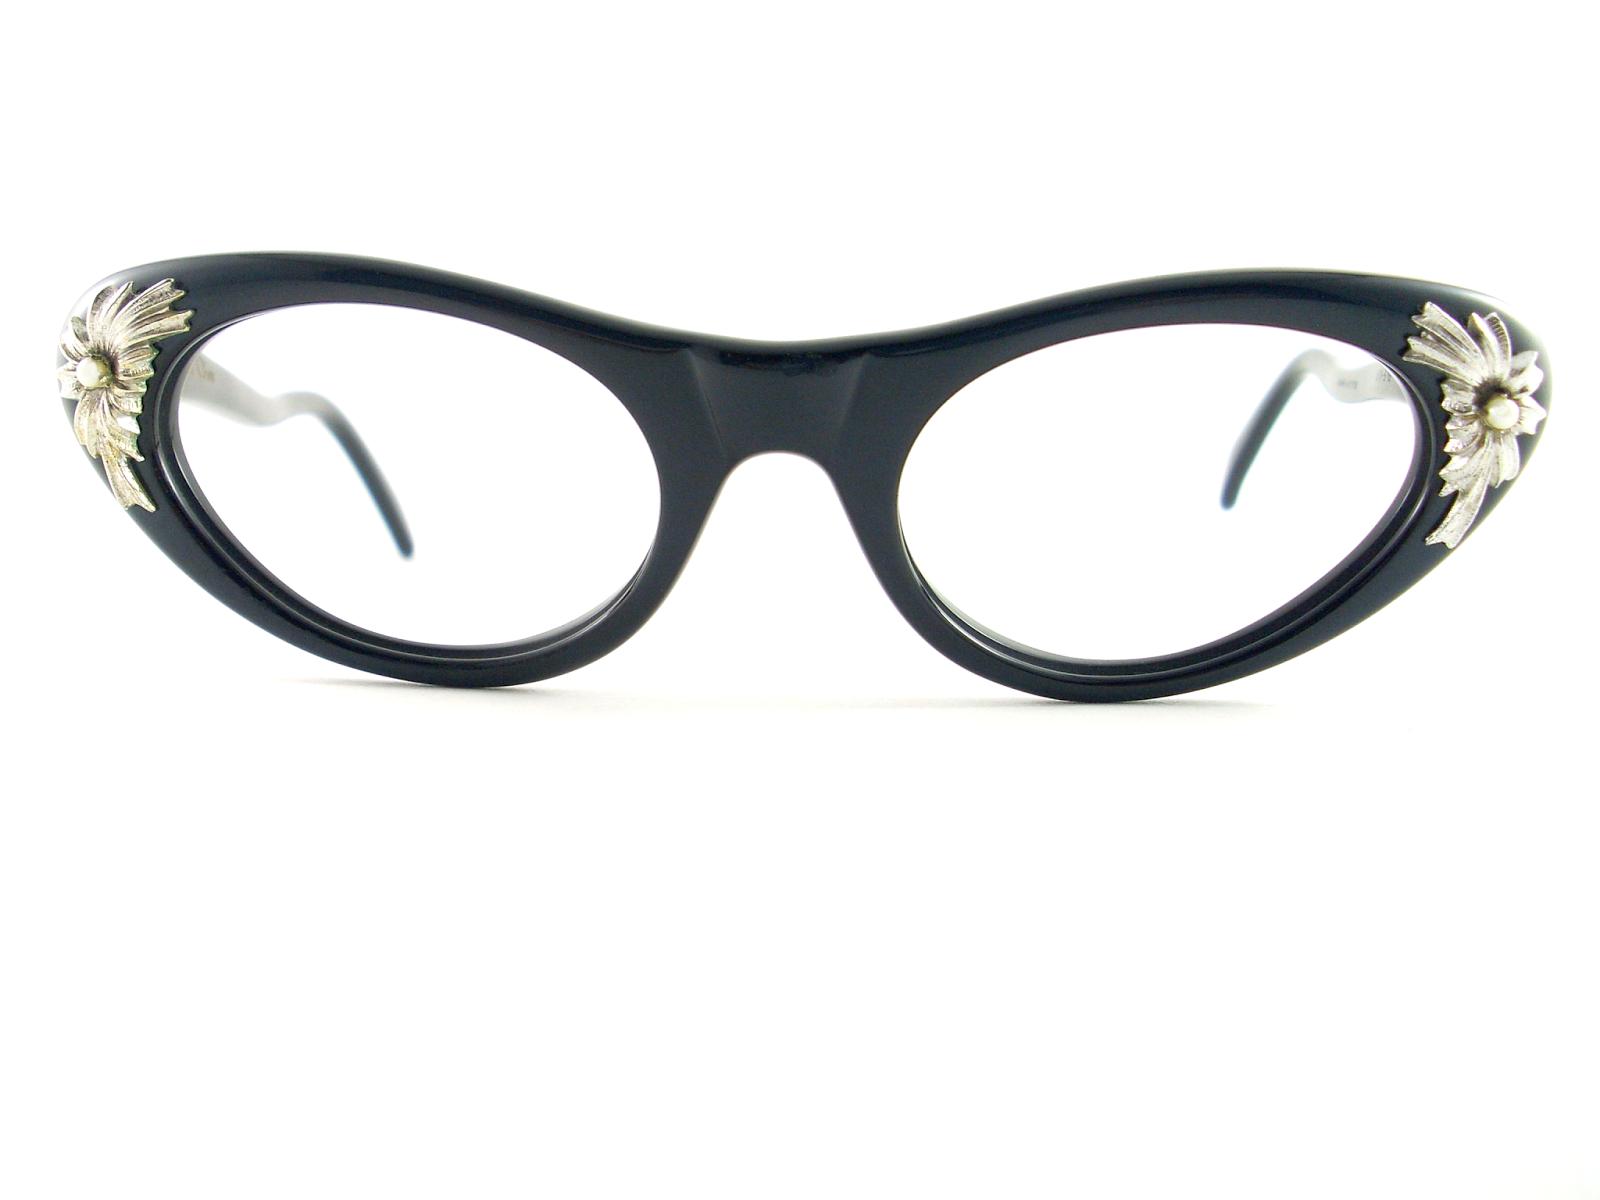 39777ba15fc Vintage Eyeglasses Frames Eyewear Sunglasses 50S  VINTAGE CAT EYE ...